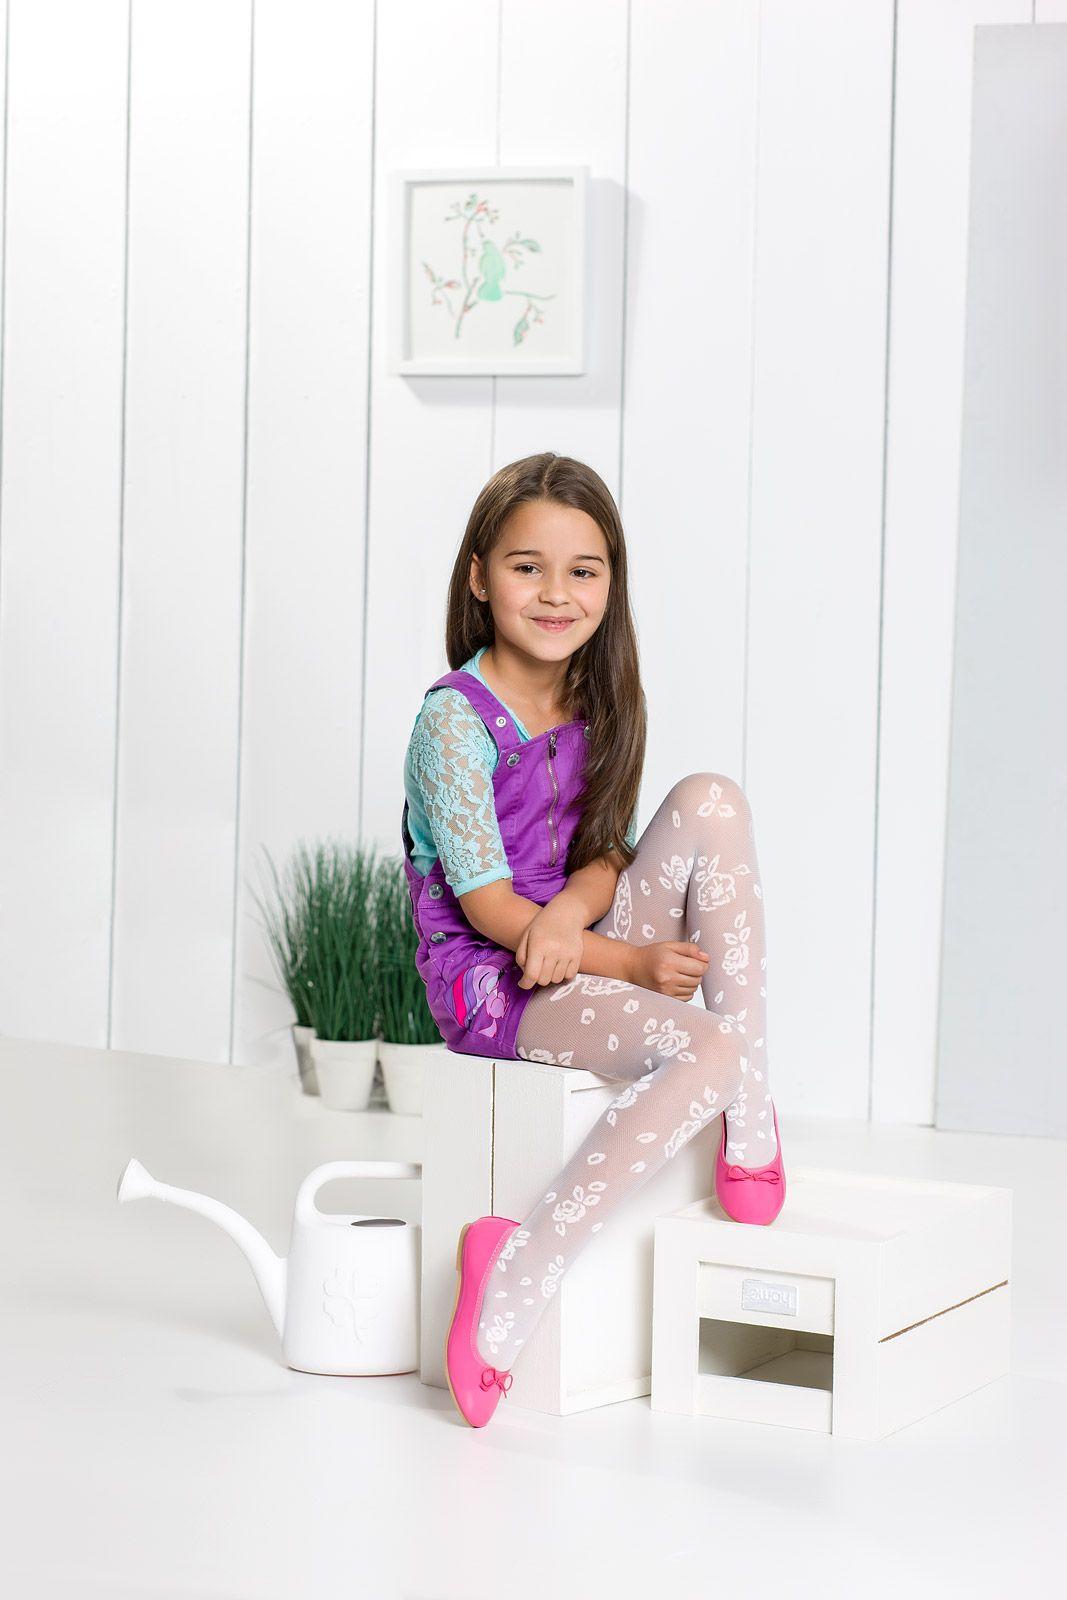 Mari 02 tights kids girl patterned flowers spring summer spring summer collection for - Monalisa moda infantil ...